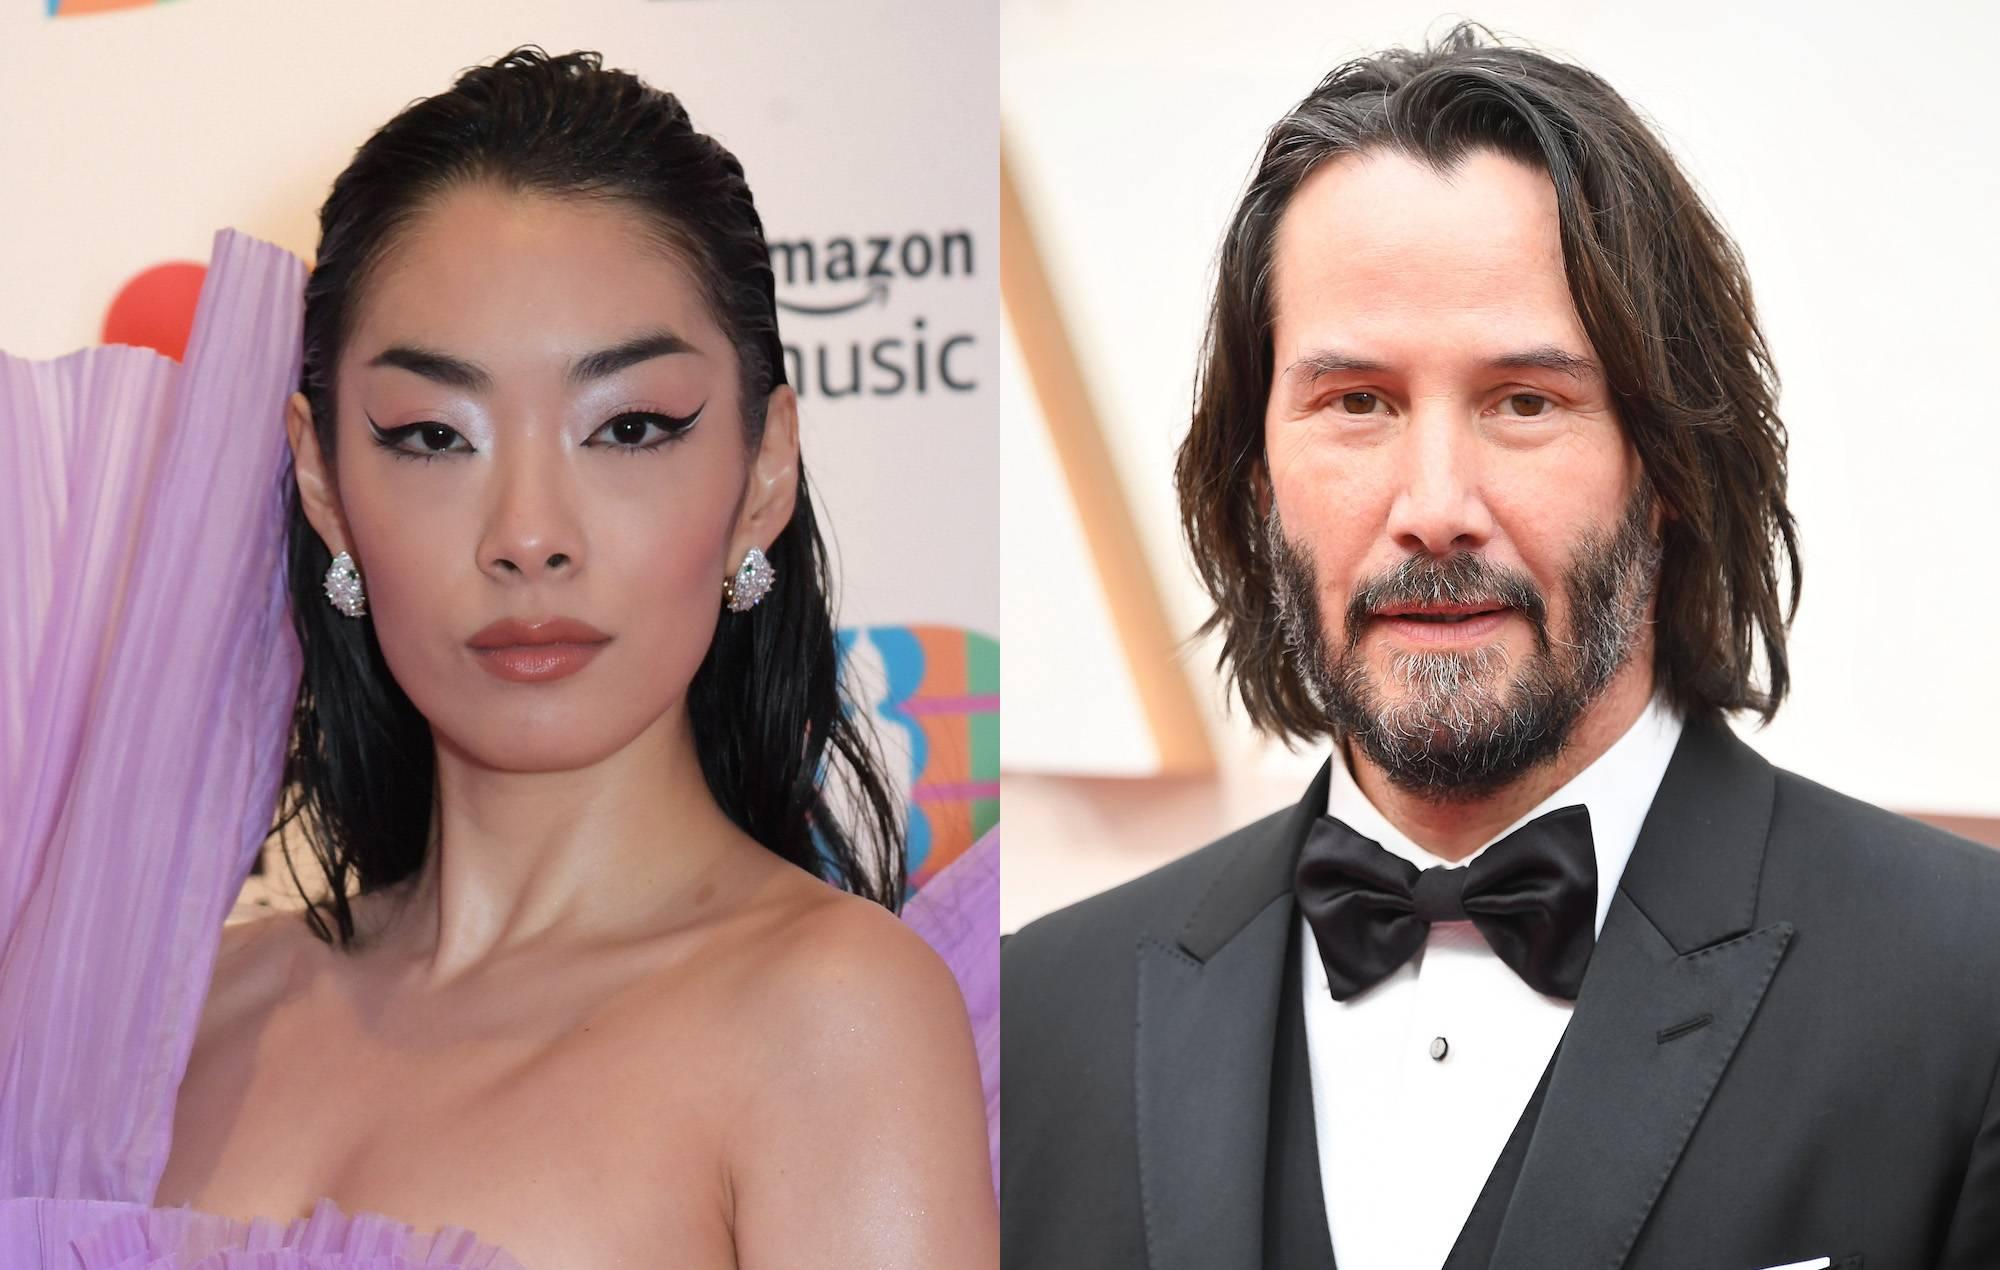 Rina Sawayama set to star in 'John Wick 4' alongside Keanu Reeves